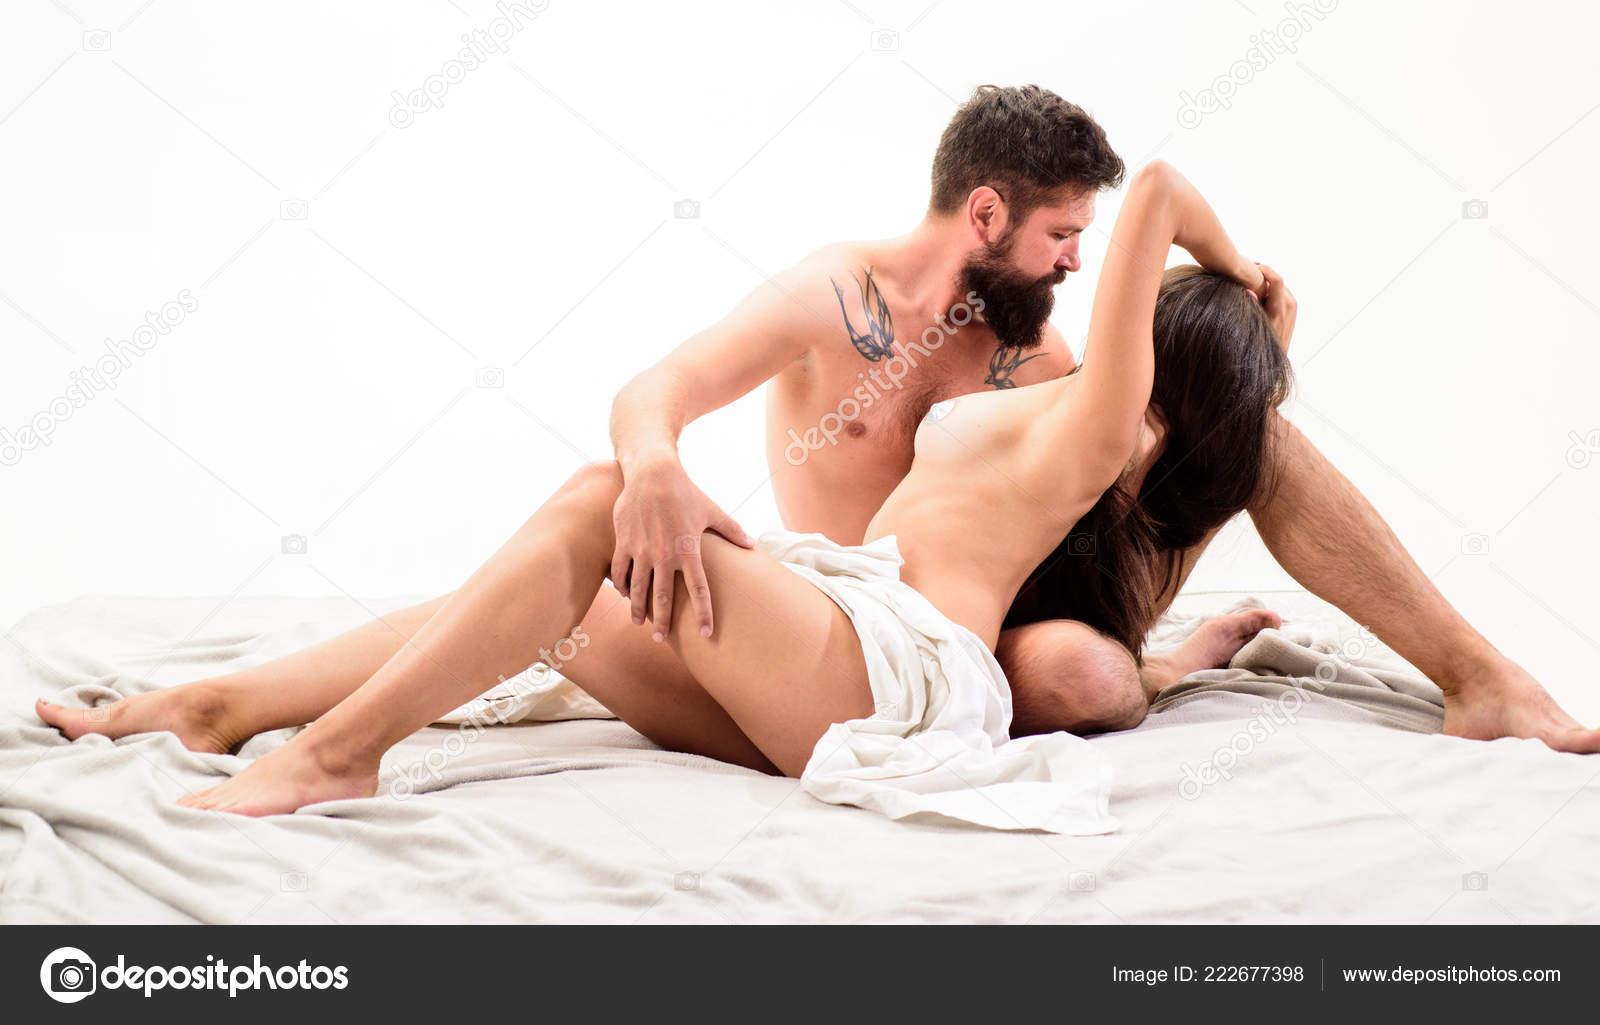 hentai girl taught sex ed